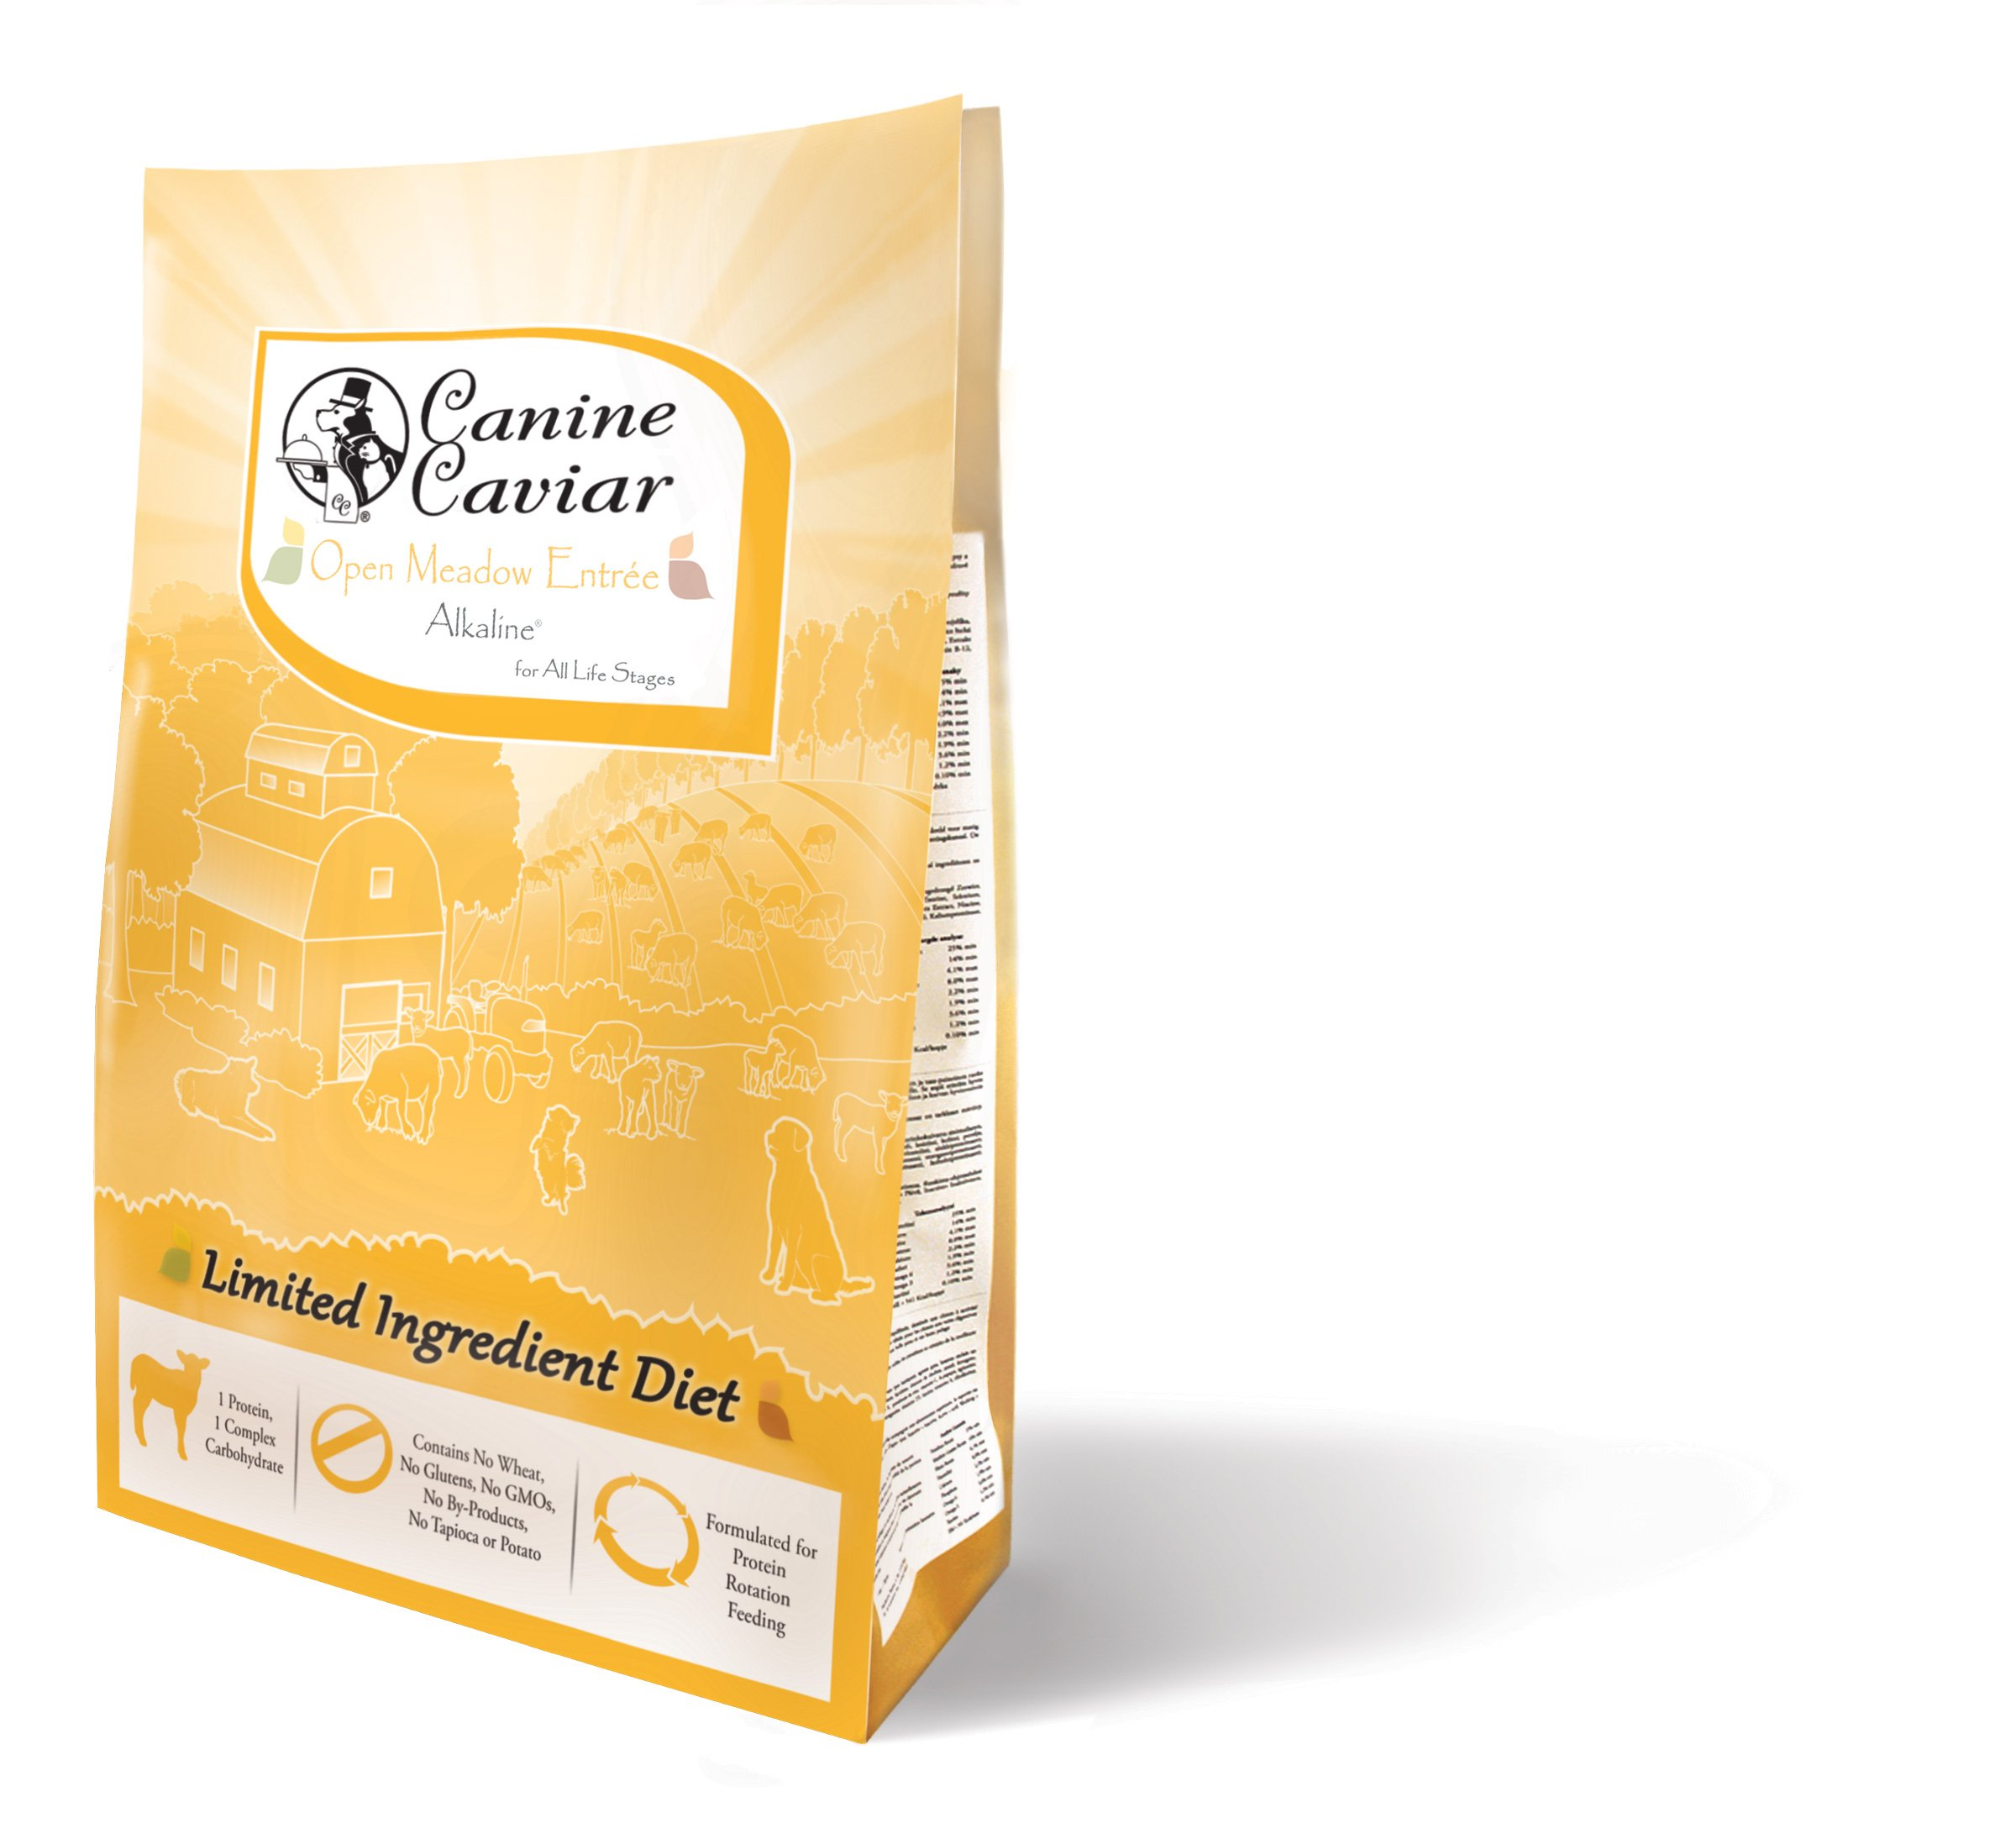 Canine Caviar Dry All Holistic Grain-Free - Dry Dog Food, Alkaline, Lamb & Pearl Millet, 22 lbs. by Canine Caviar